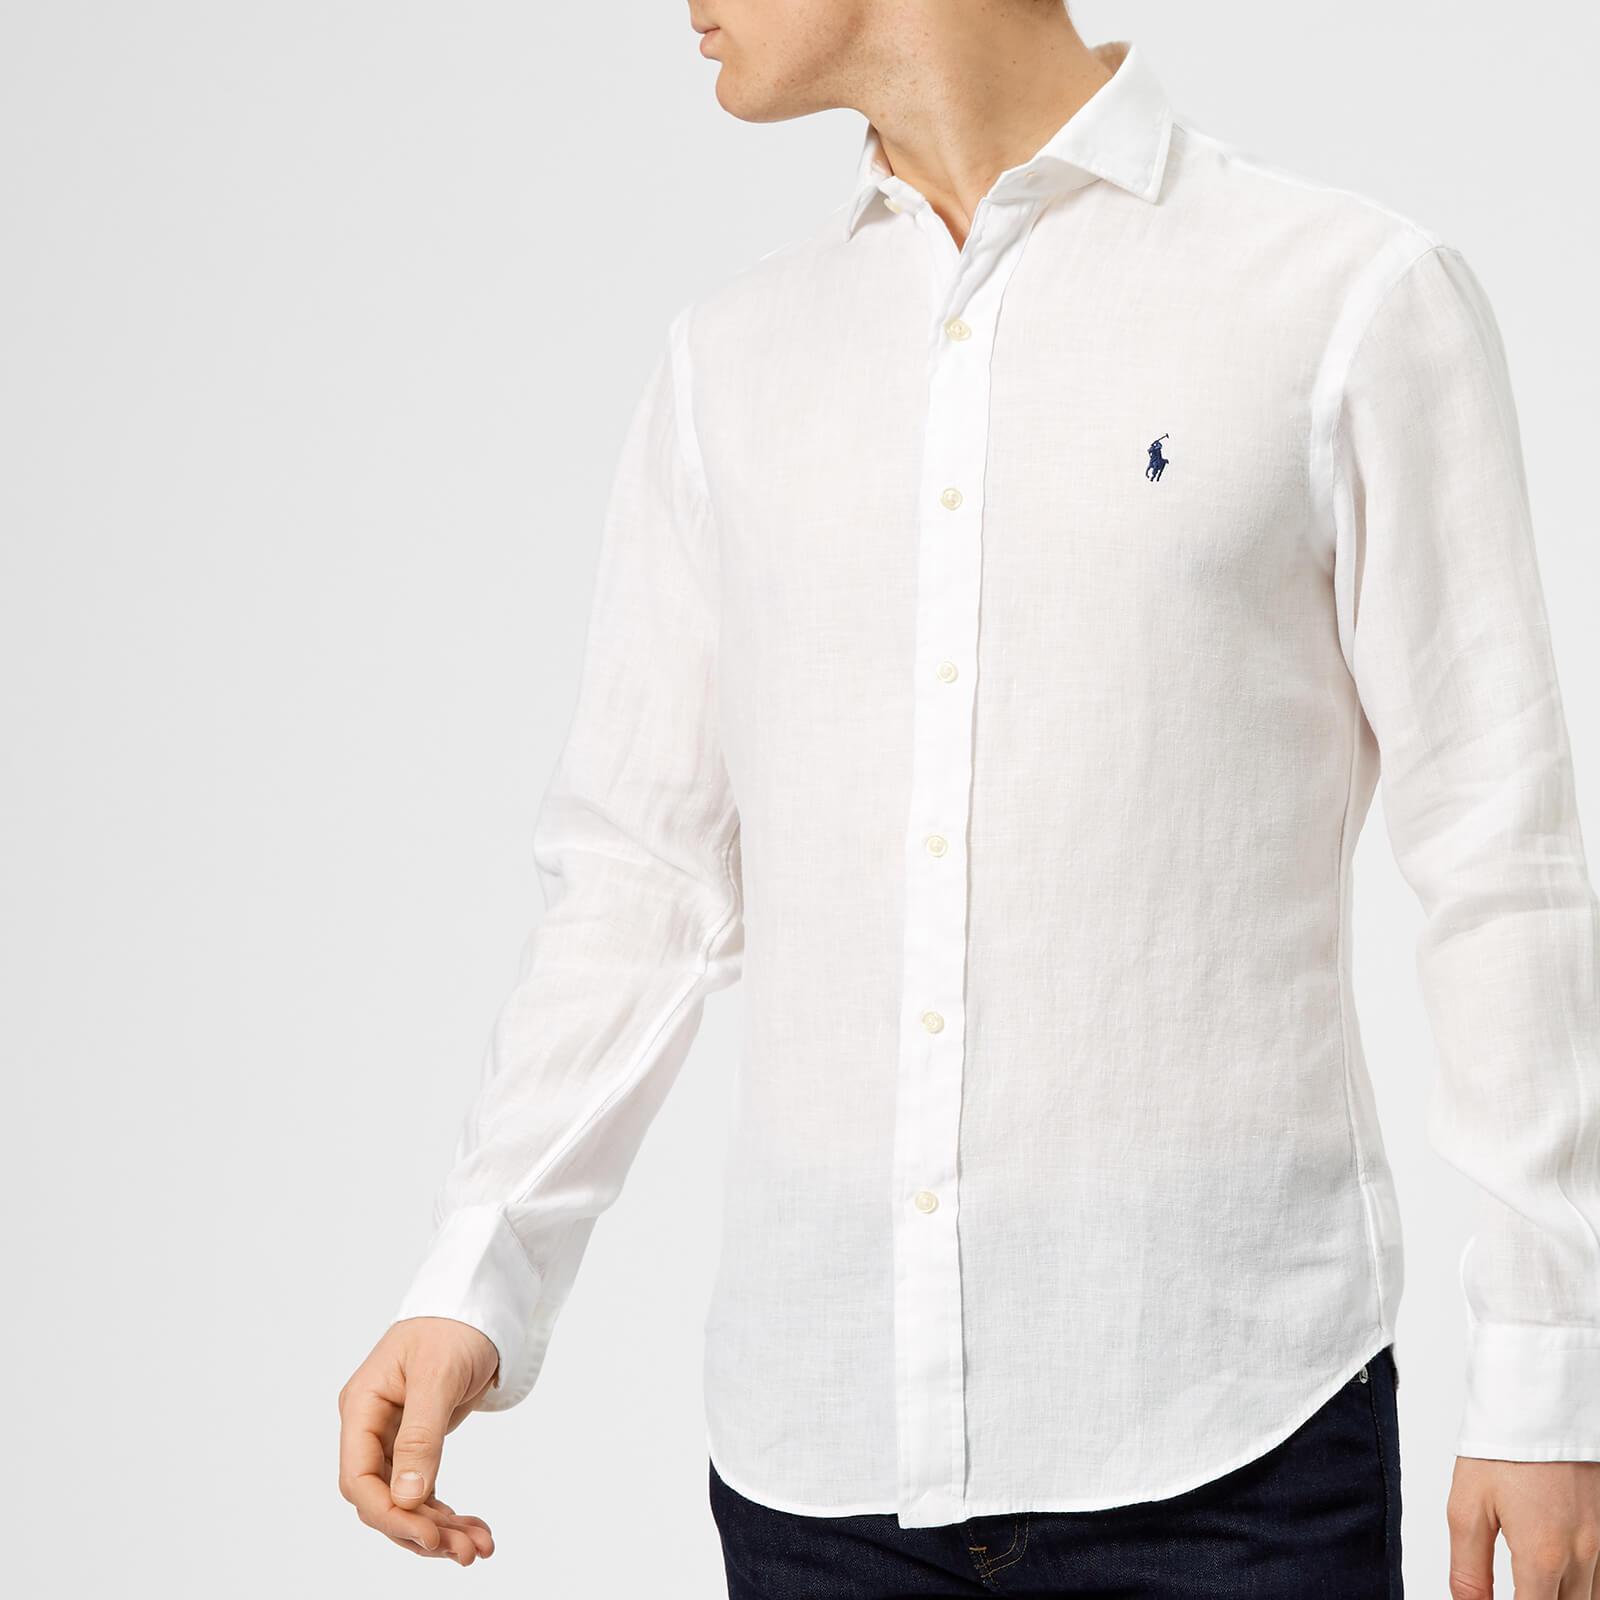 557d82f4 Mens Long Sleeve White Linen Shirts - DREAMWORKS